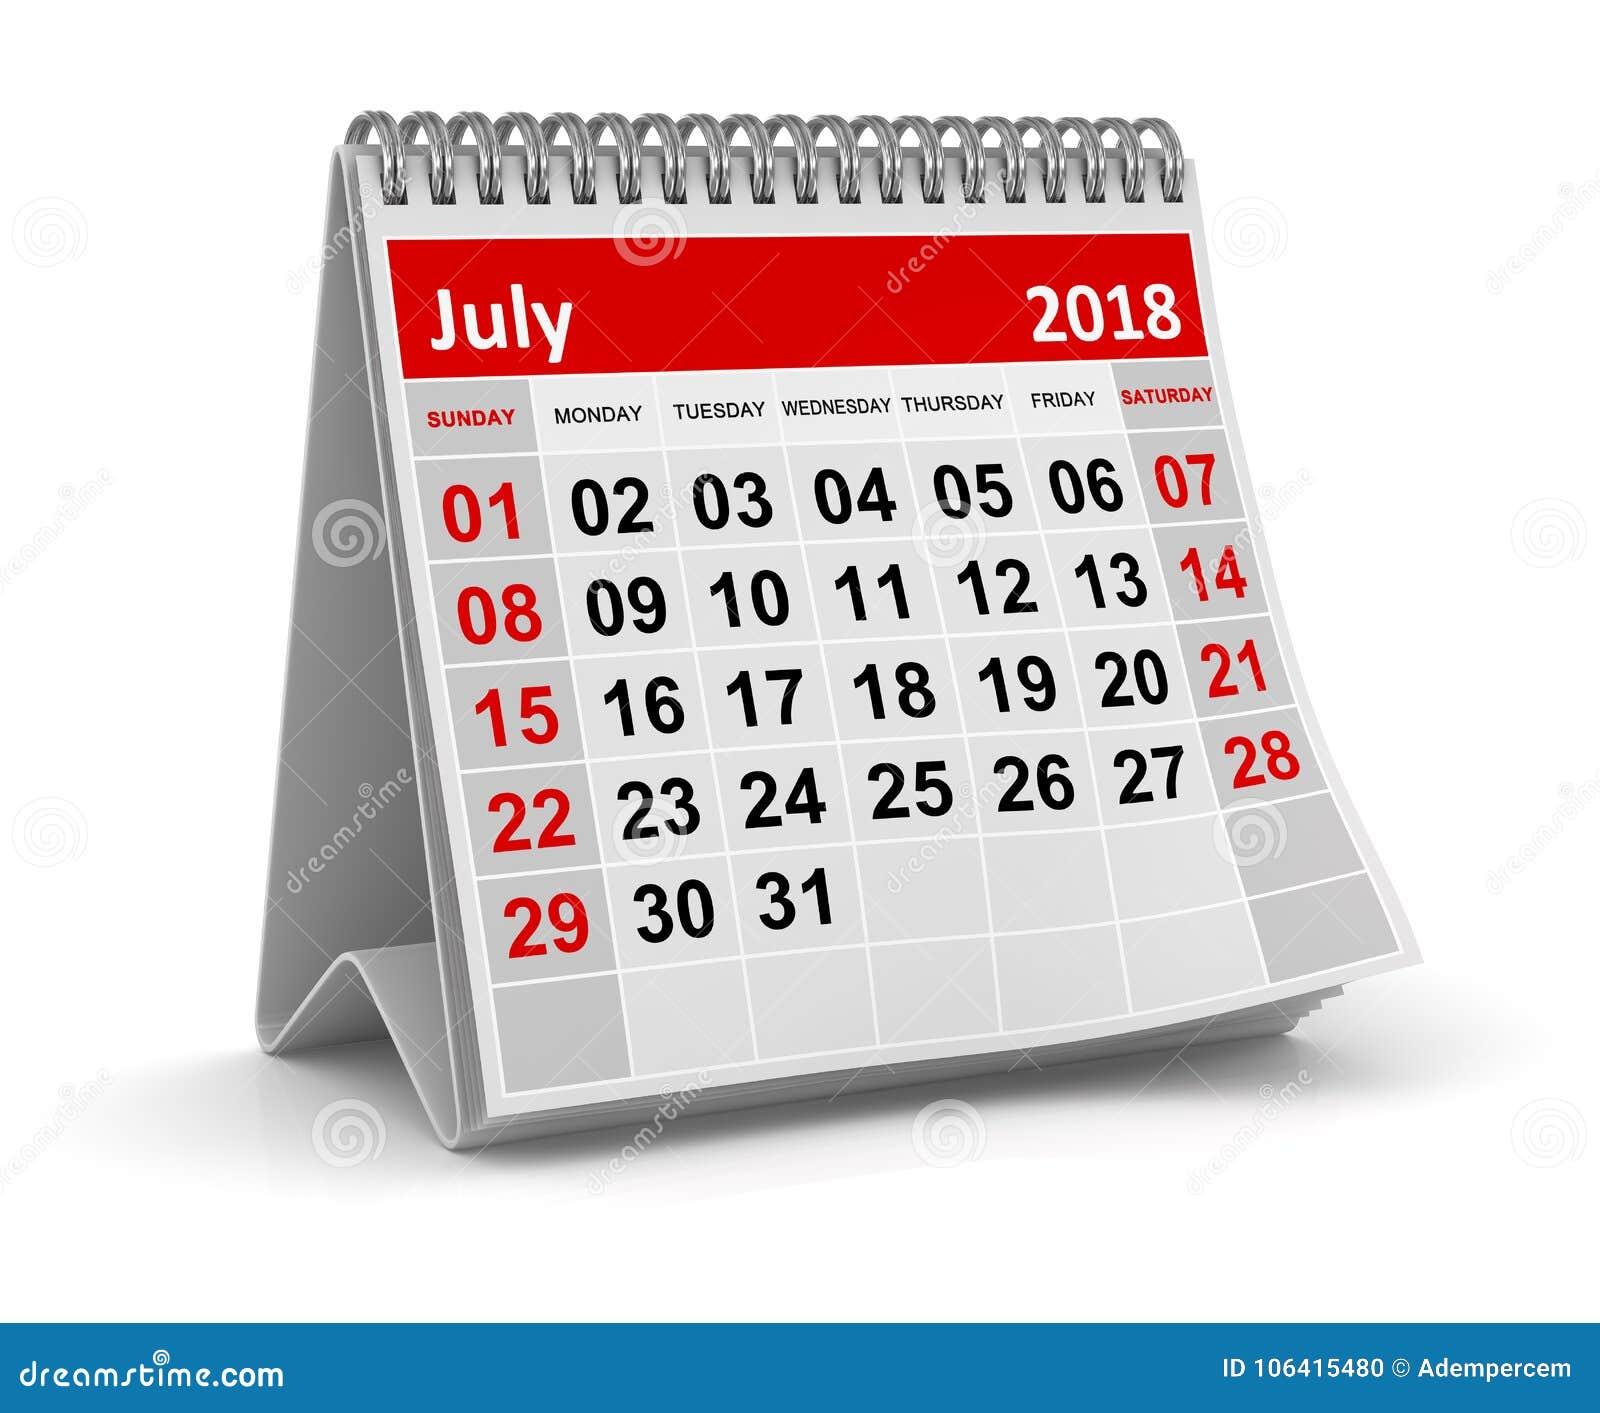 Juli 2018 - kalender